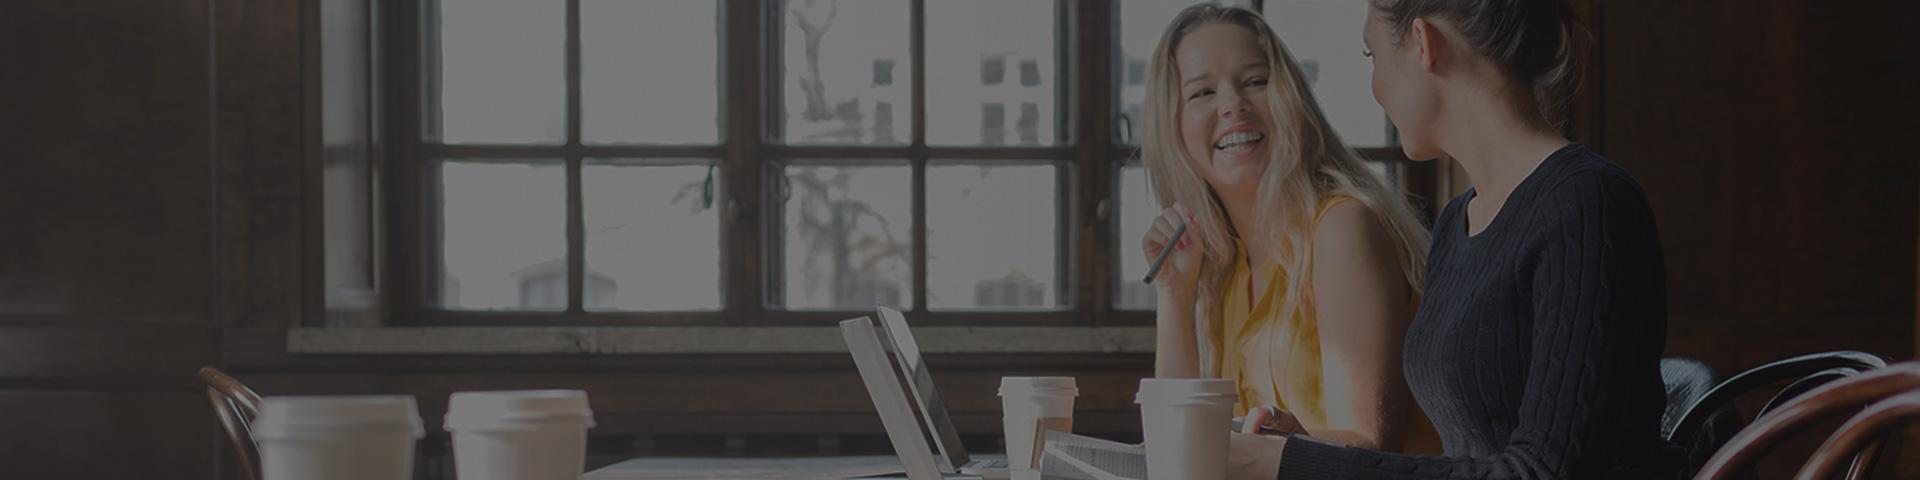 Scopri la versione di Office più adatta a te.